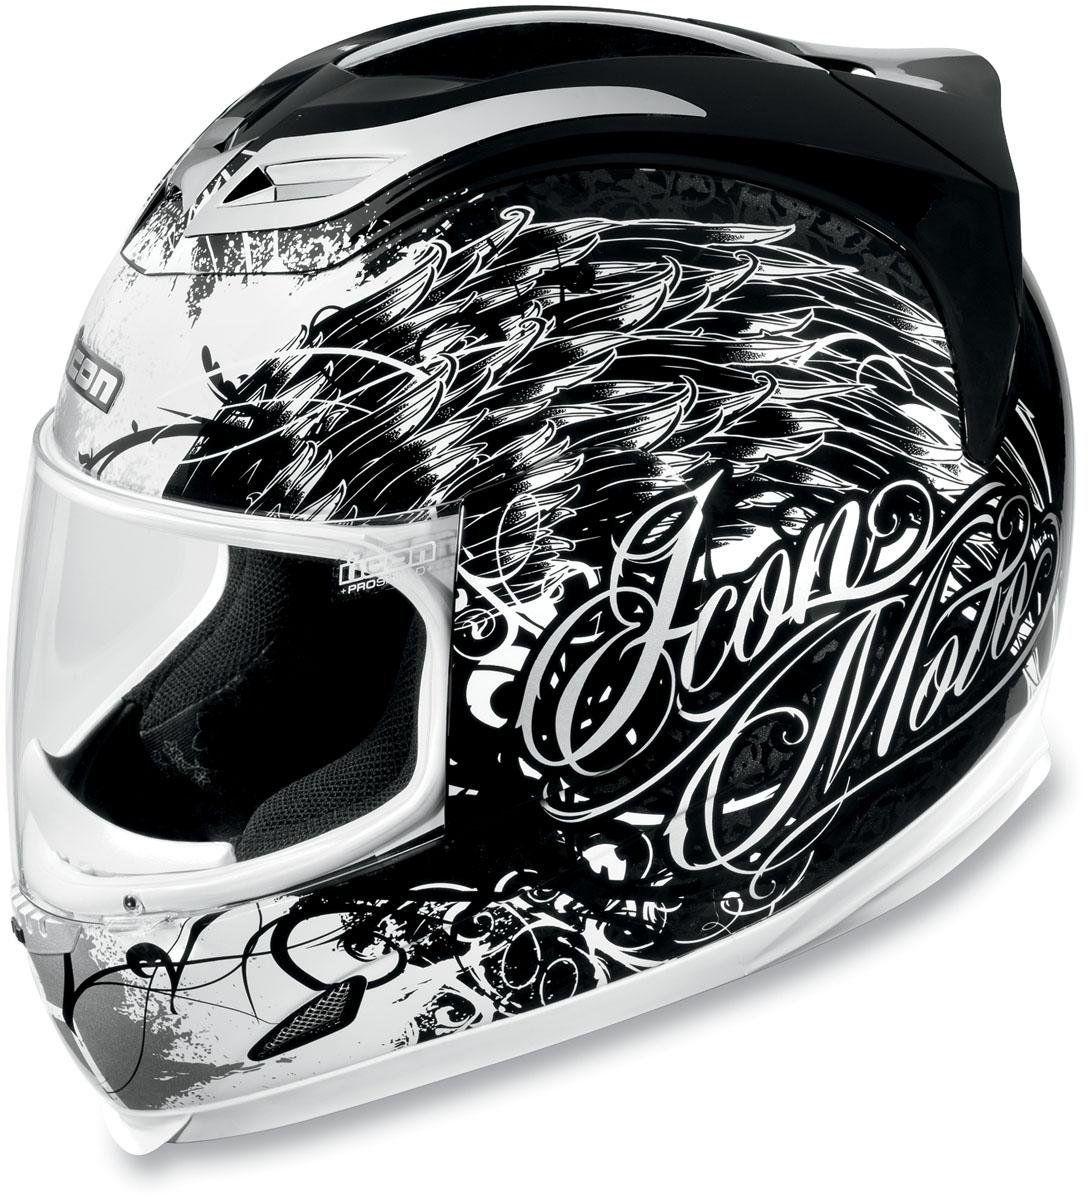 Icon Airframe Street Angel Helmet , Size Sm